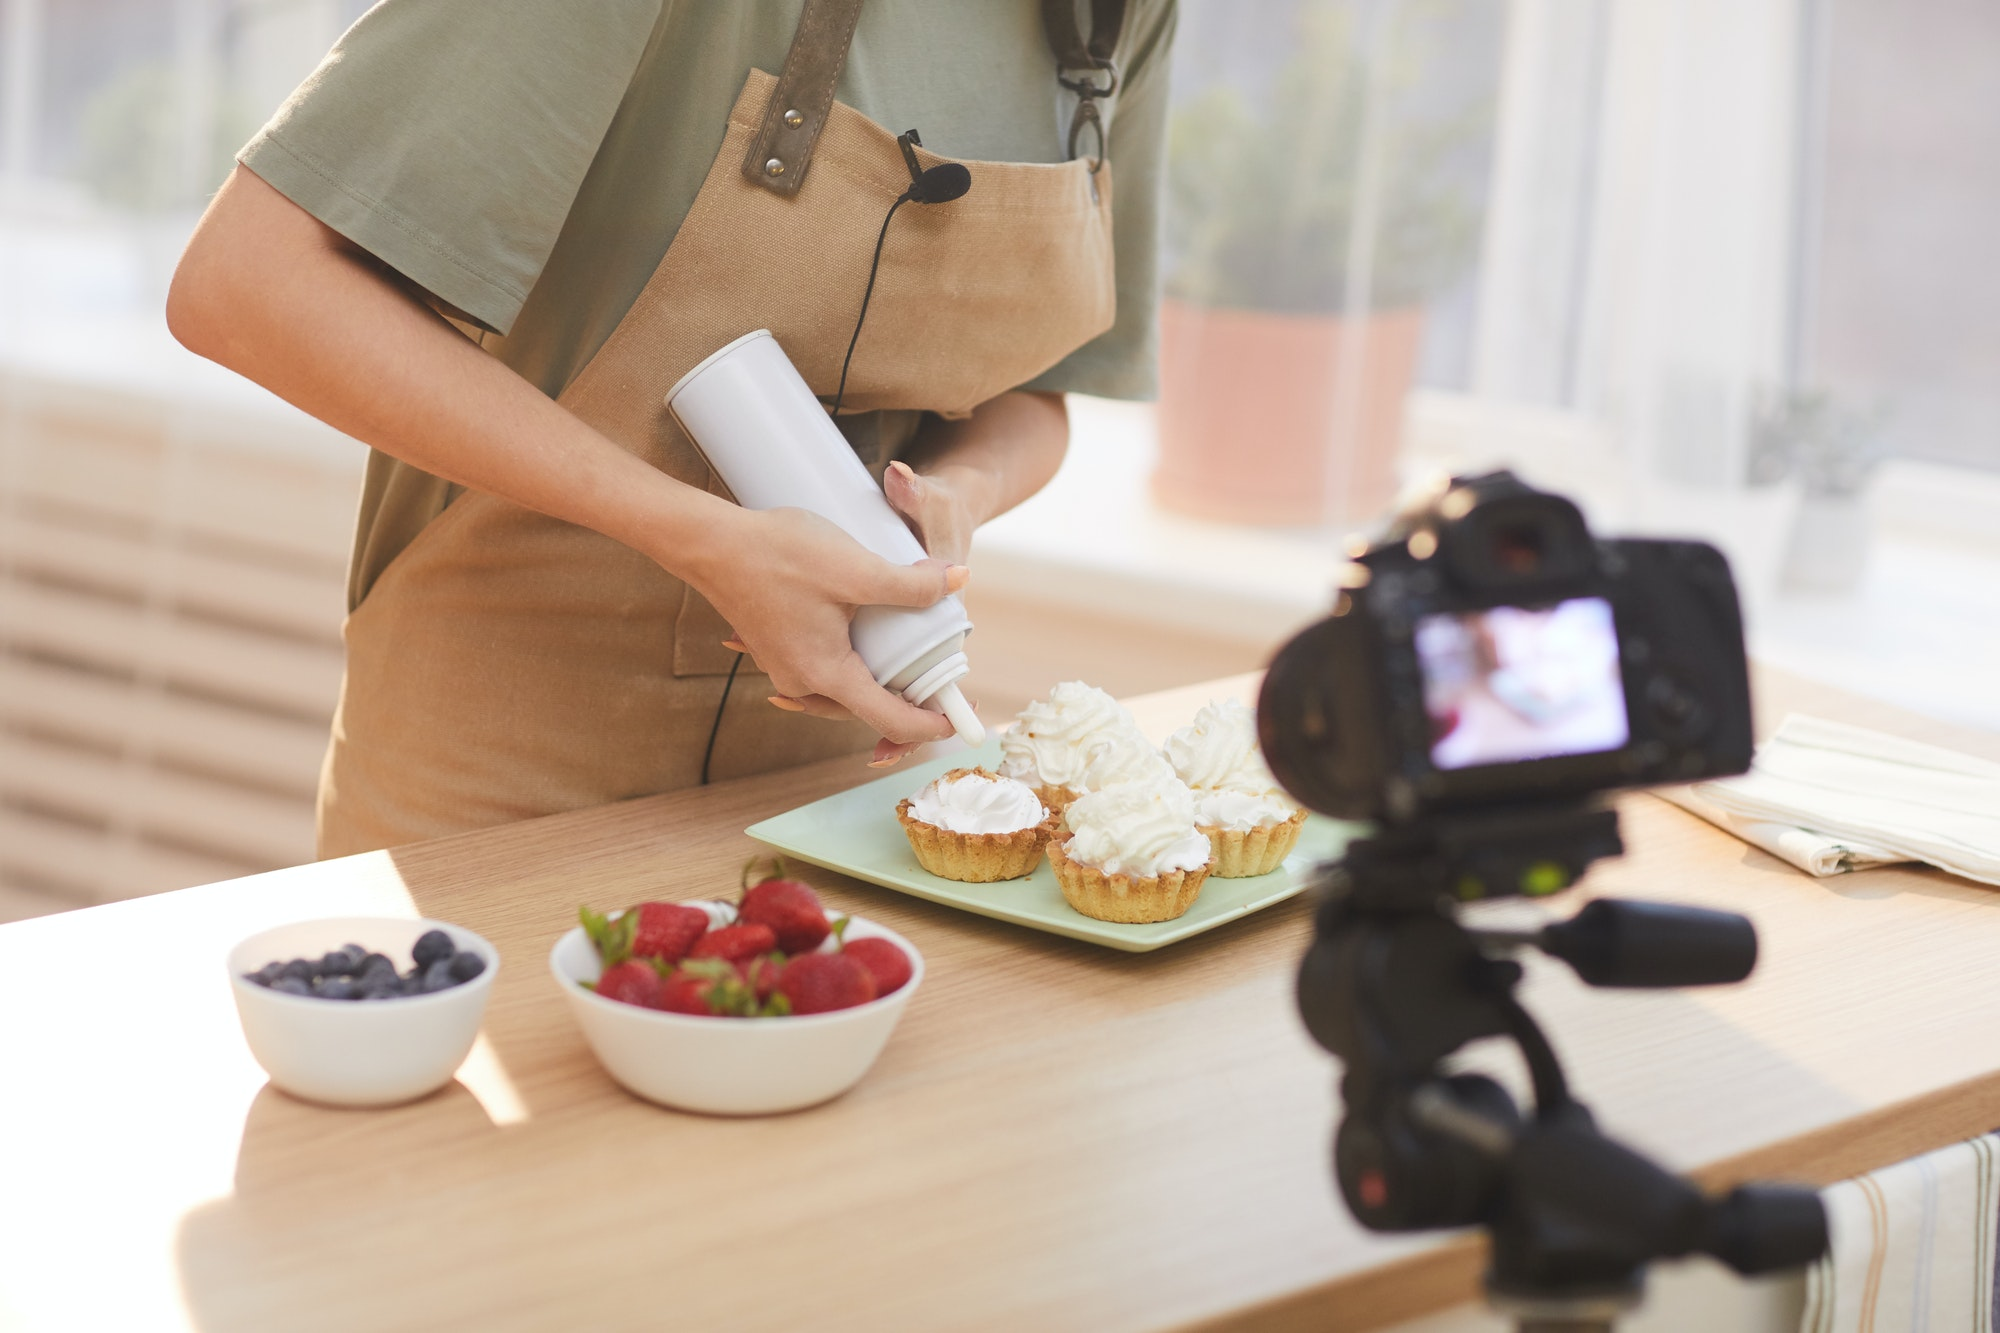 Culinary art on video